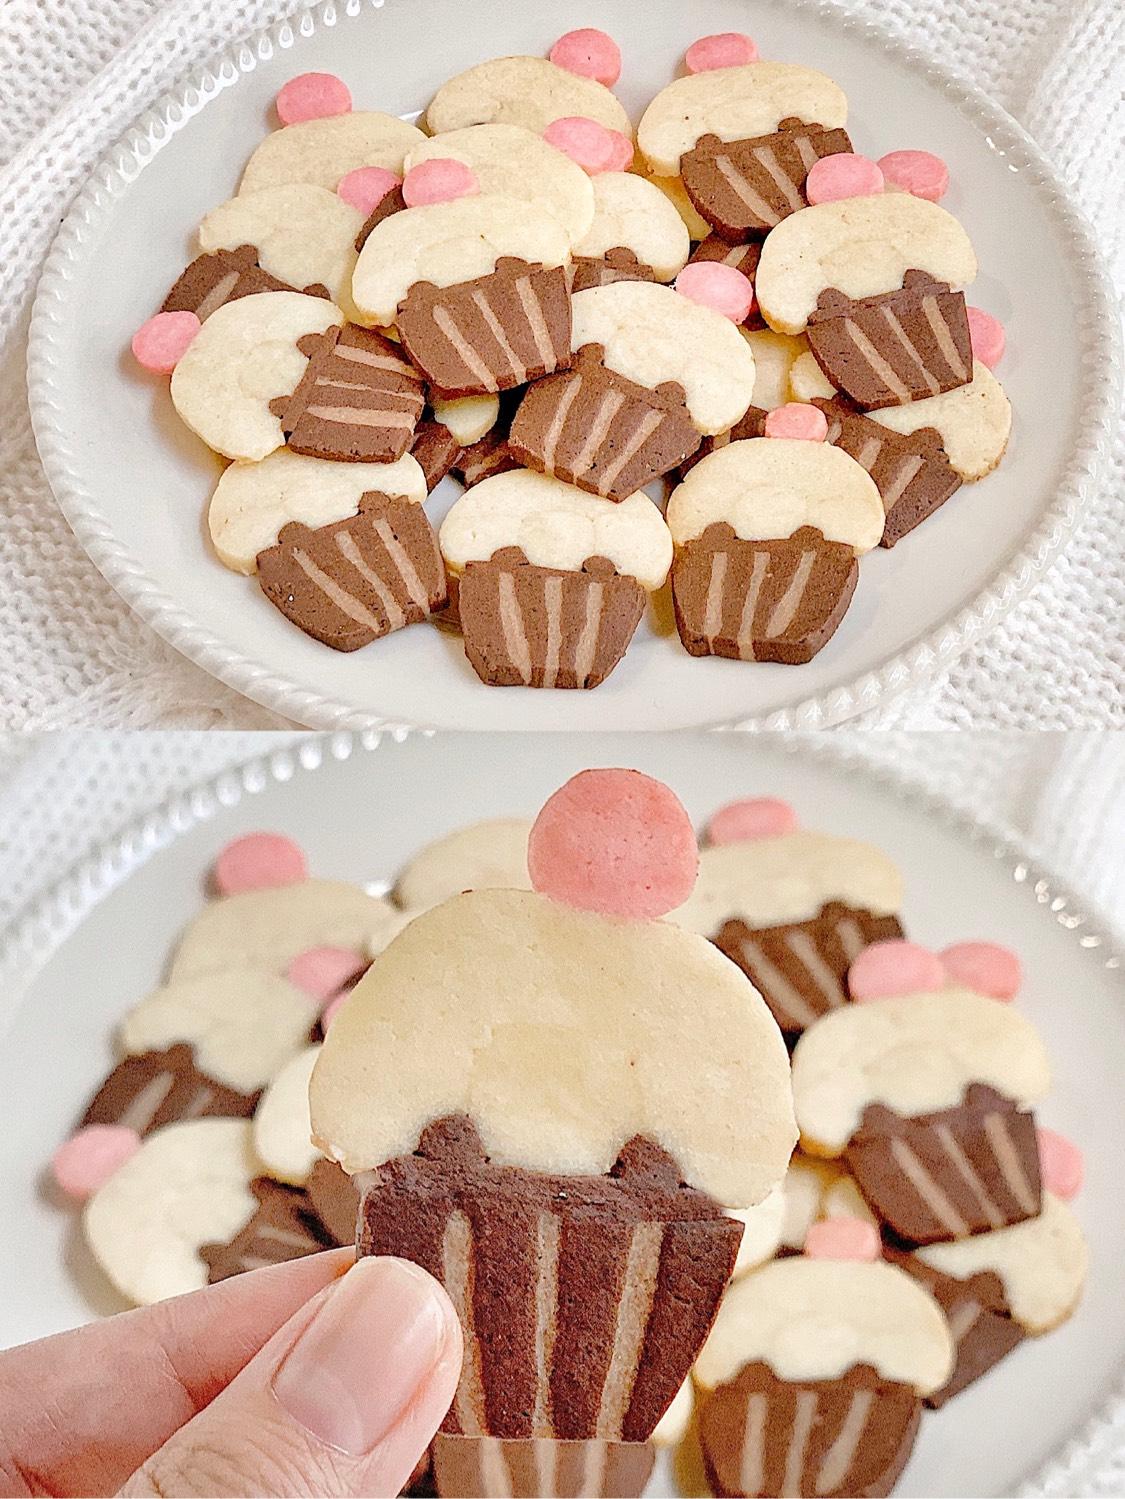 ㊙️超可爱❗️萌化了❗️一口一个的蛋糕曲